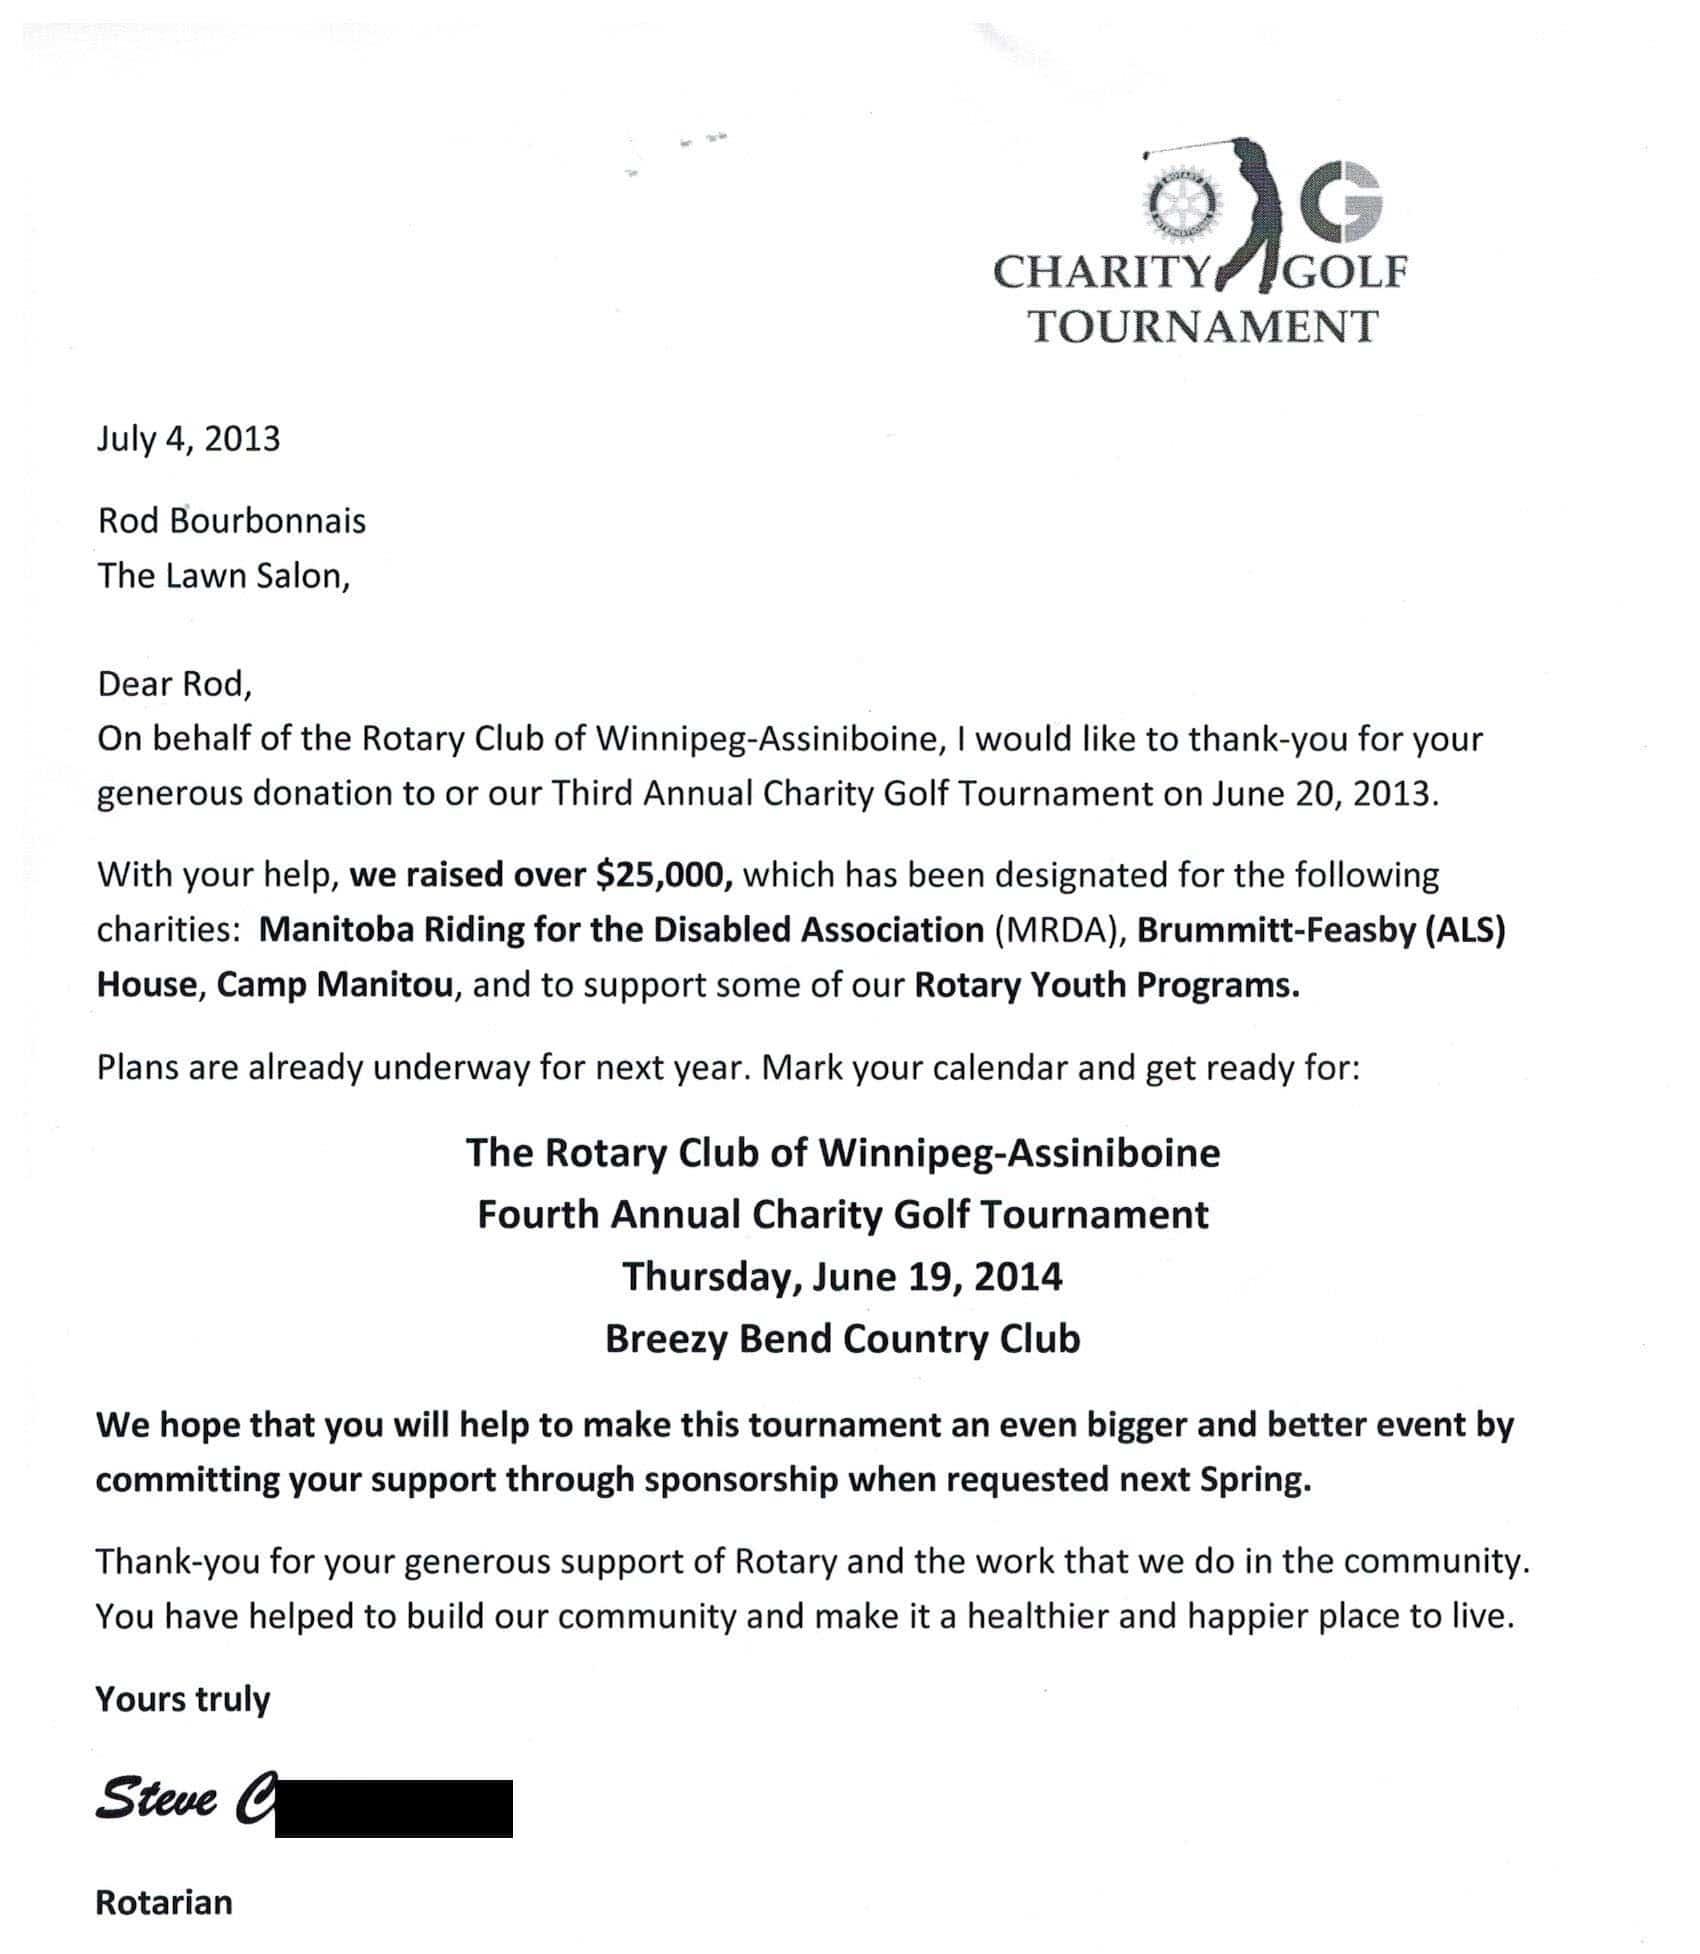 Rotary Club, July 4, 2013